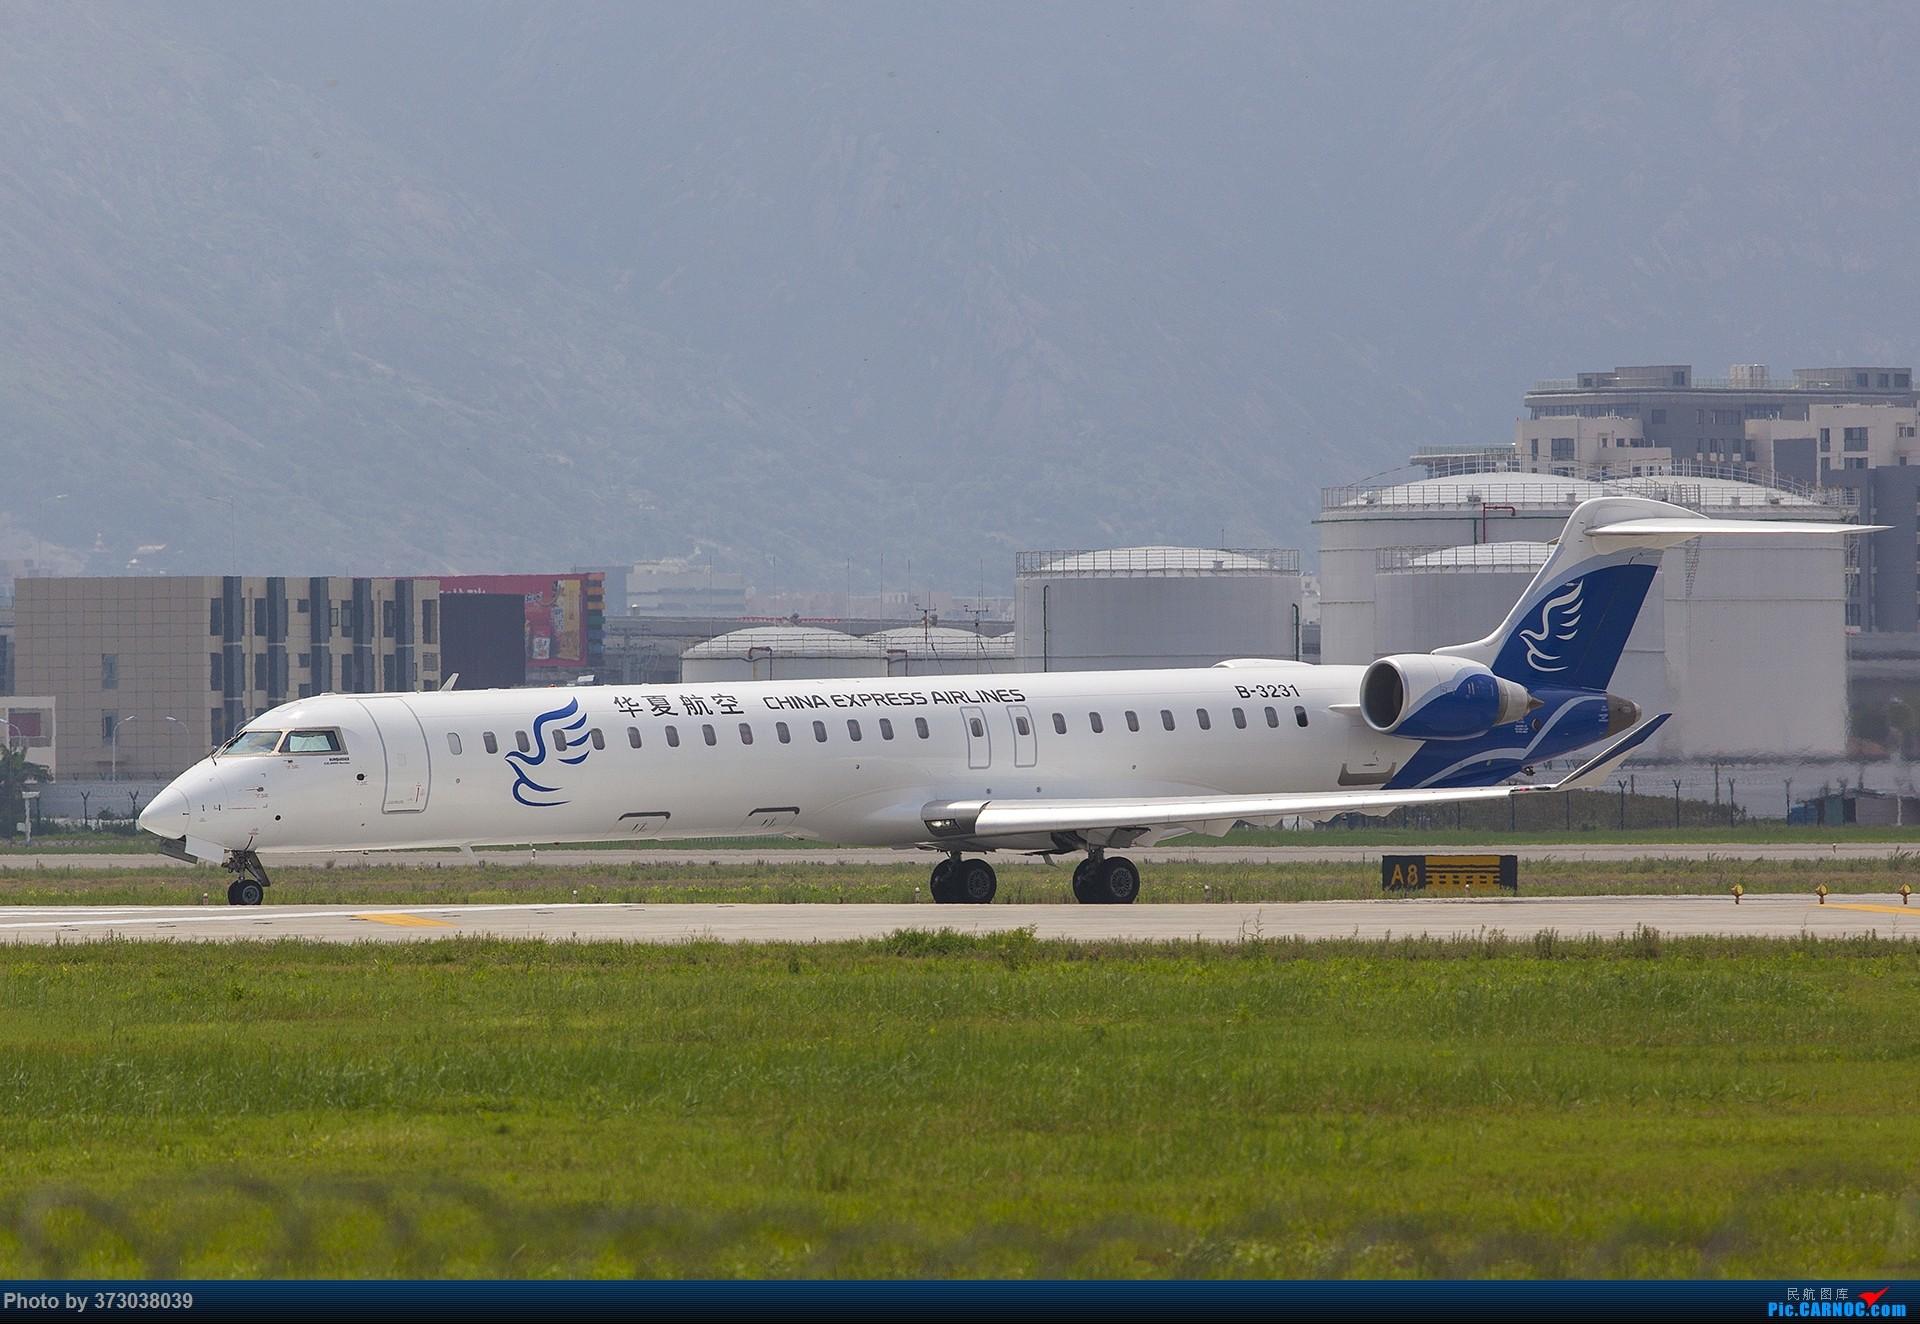 Re:[原创]【杭州飞友会】久别重逢,自个家乡的温州龙湾国际机场 BOMBARDIER CRJ900NG B-3231 中国温州龙湾国际机场